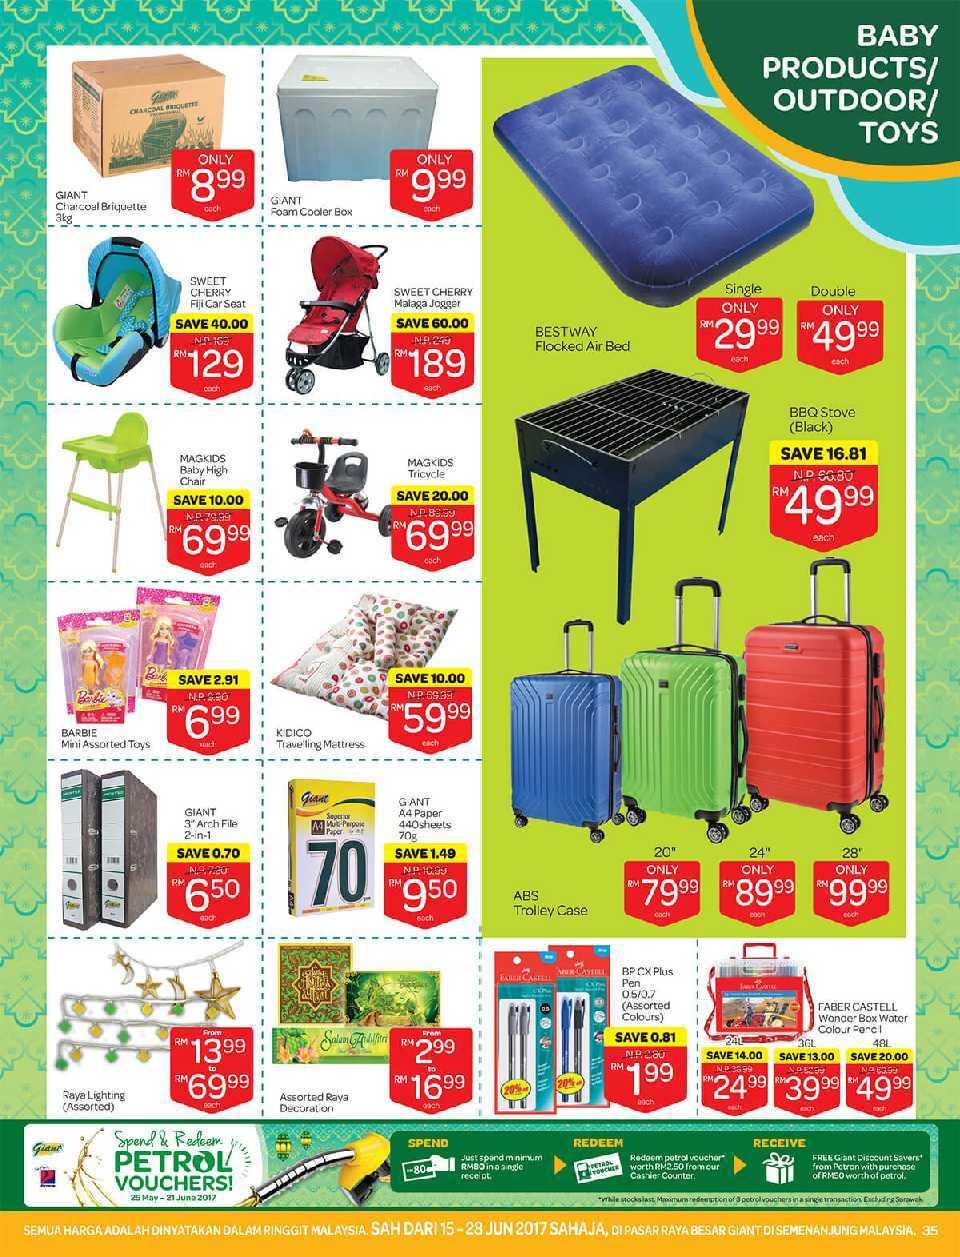 Giant Catalogue (15 June 2017 - 28 Jun 2017)